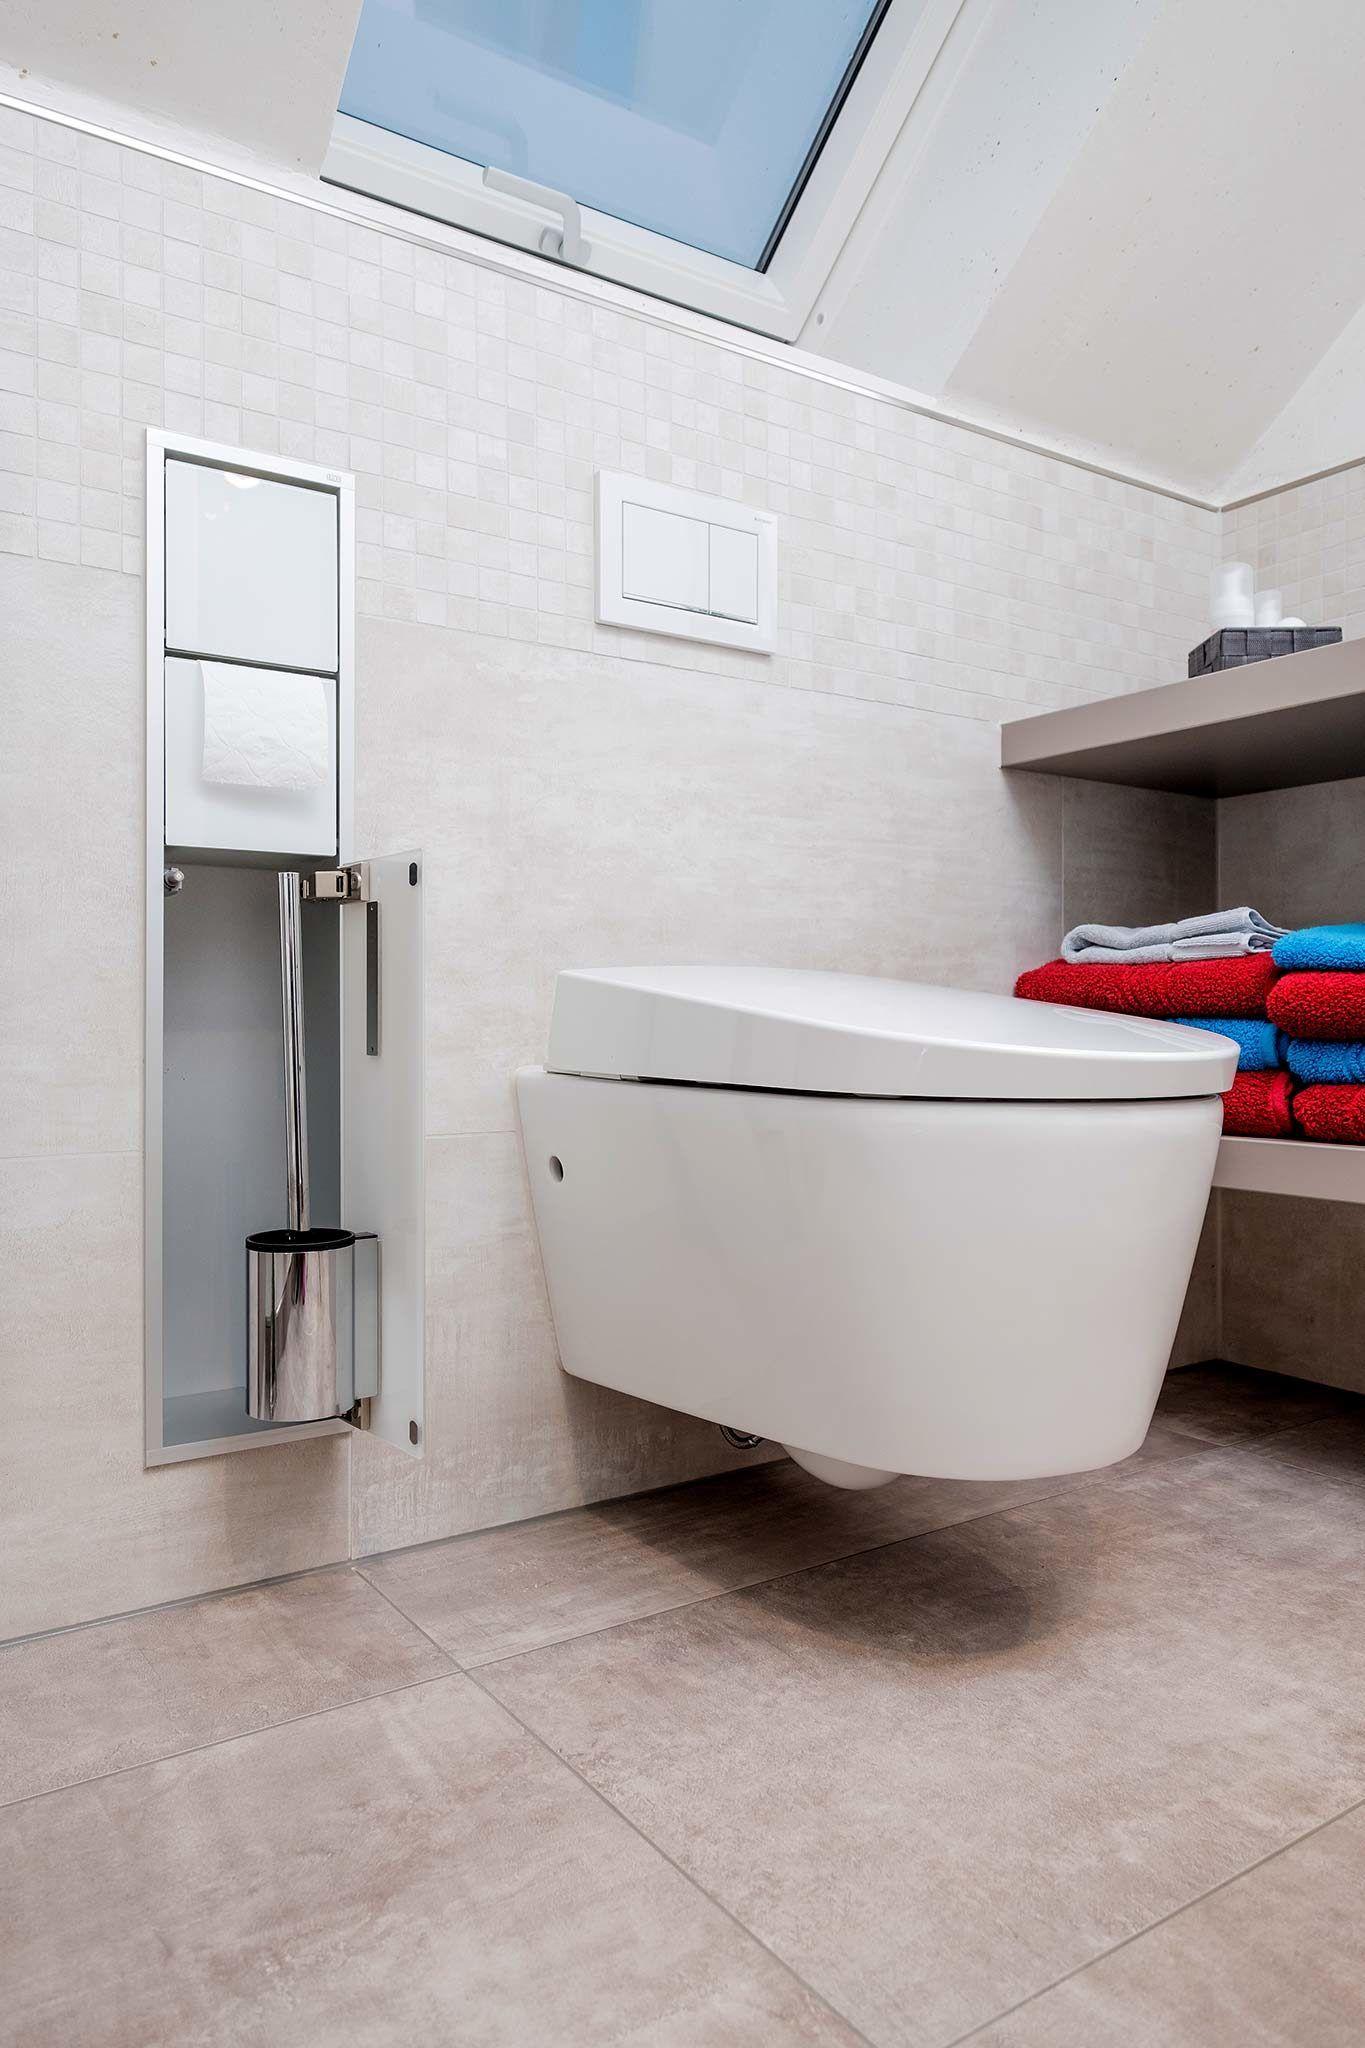 Mini Gäste Wc | Badezimmer | Bäder & Wcs | Pinterest ...